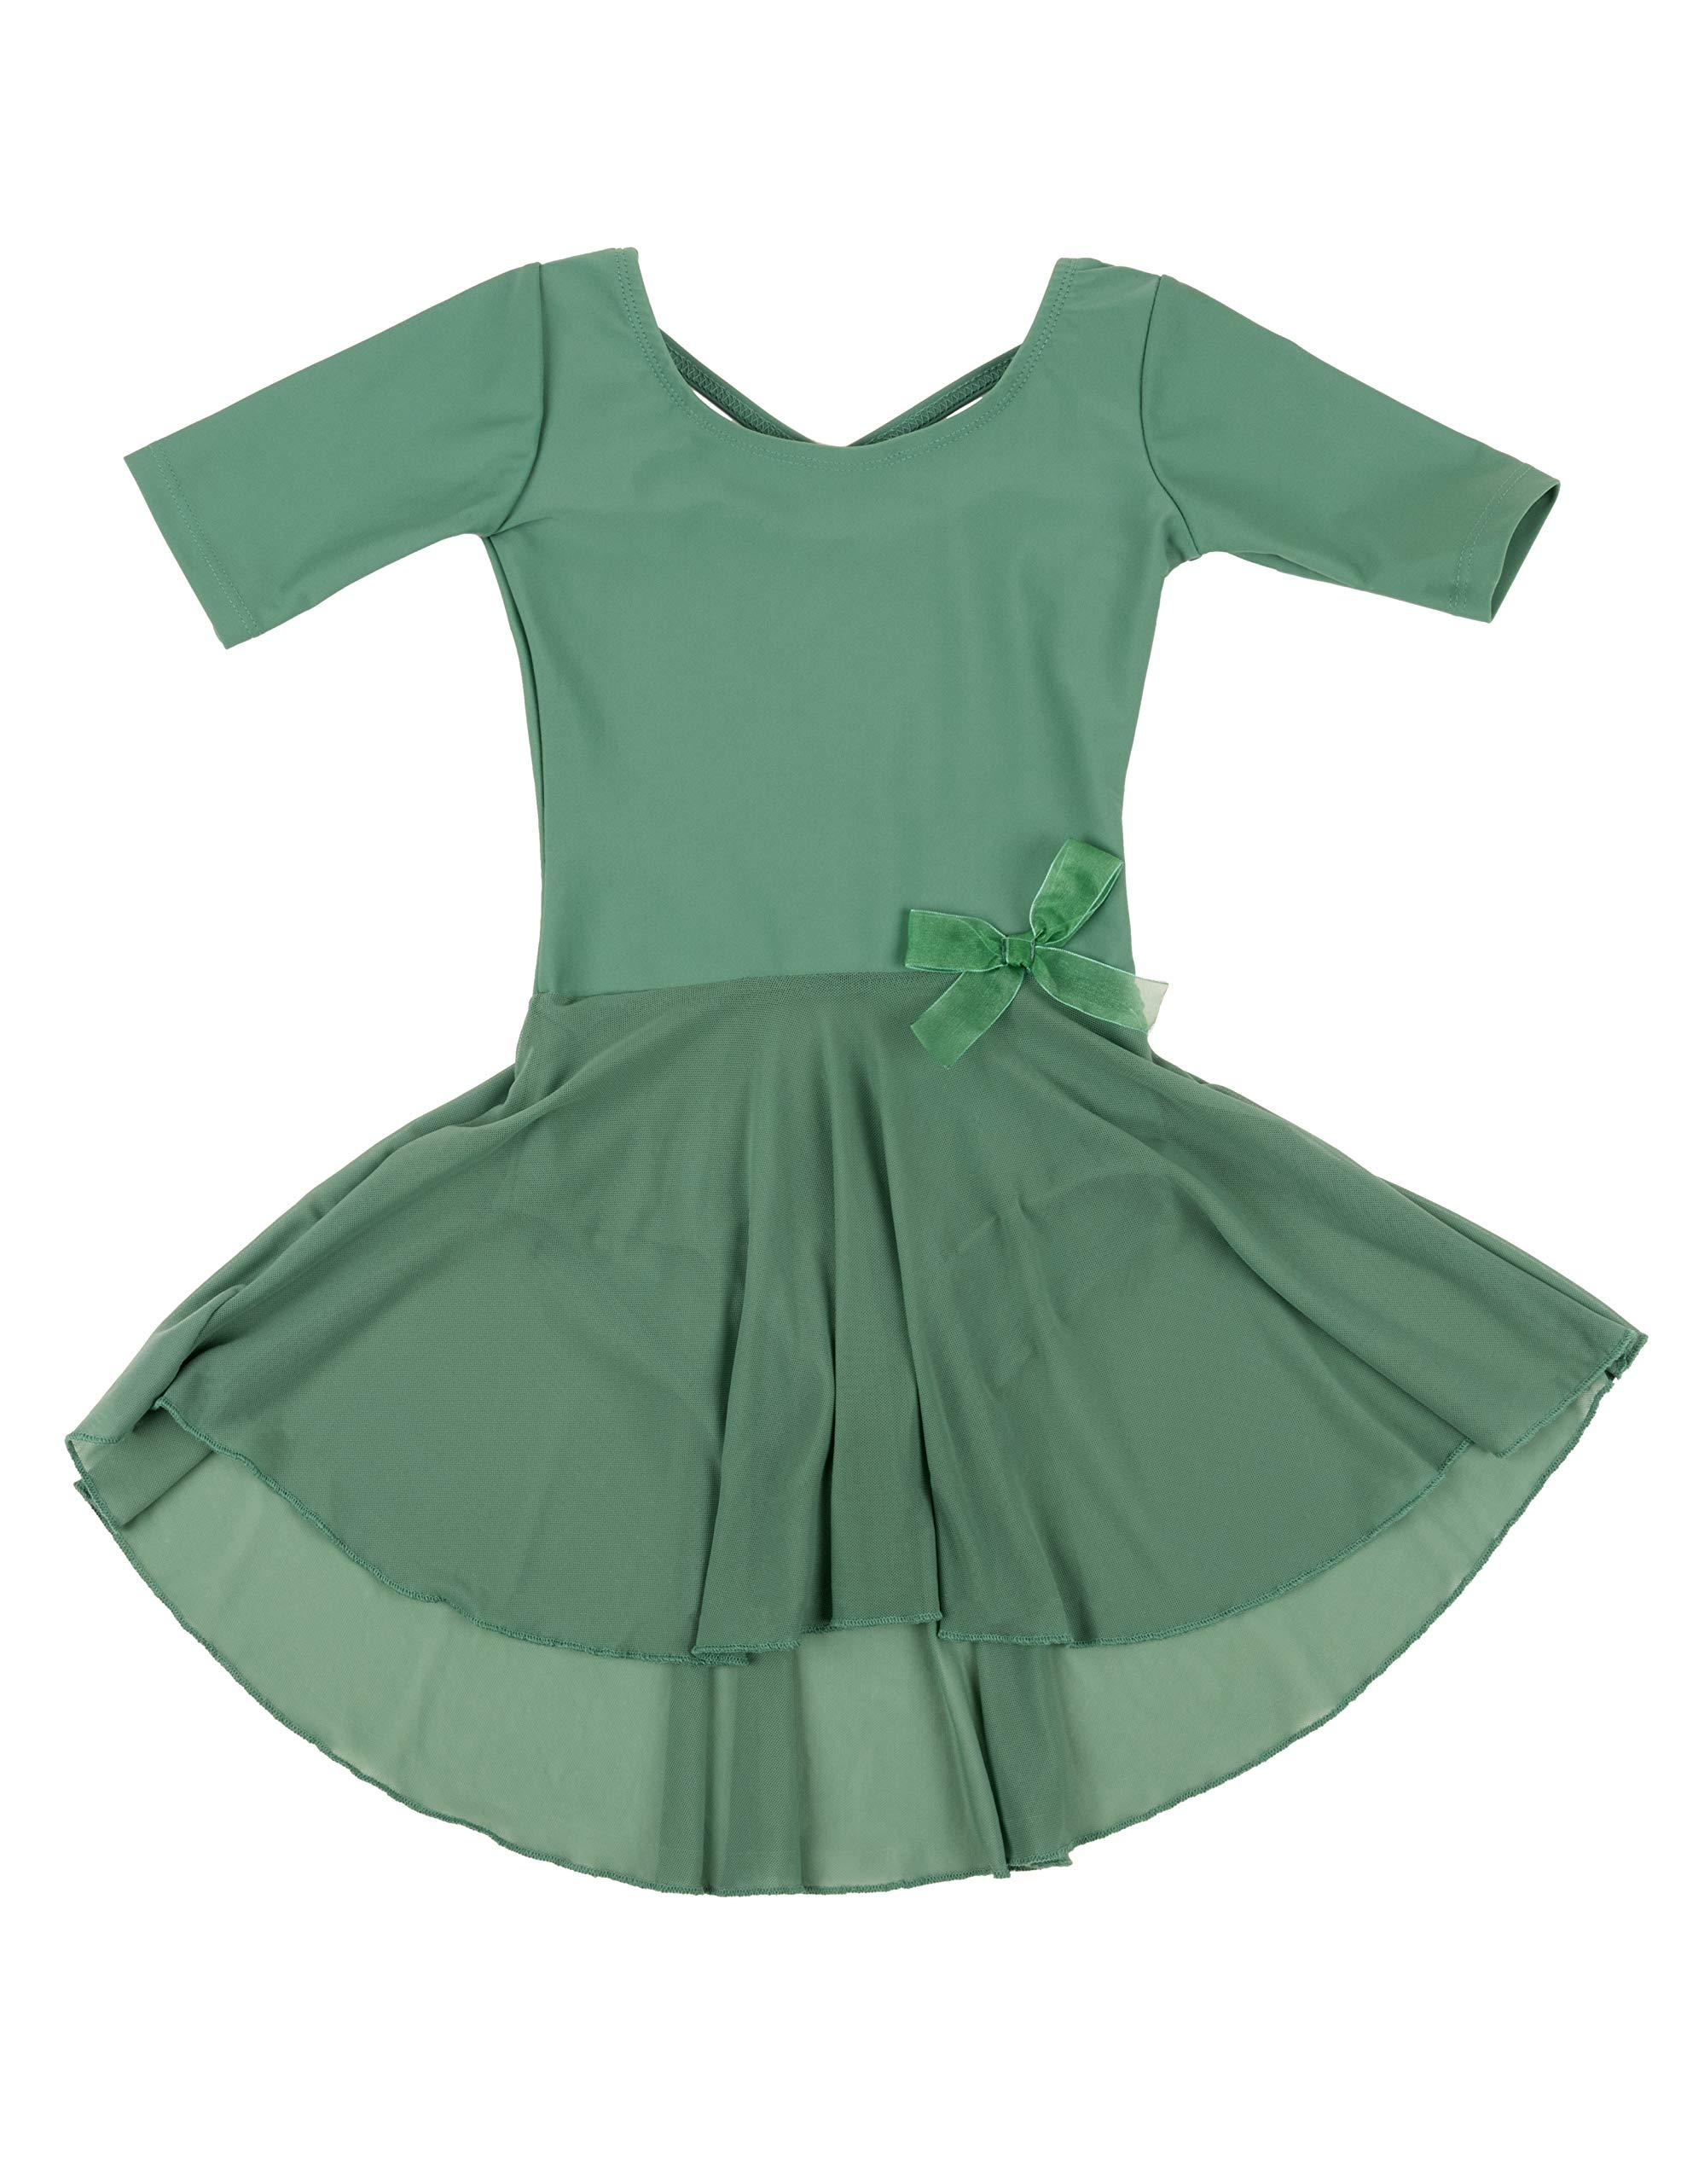 Leveret Kids Girls Skirt Leotard Green Long Sleeve Small 6 8 Years